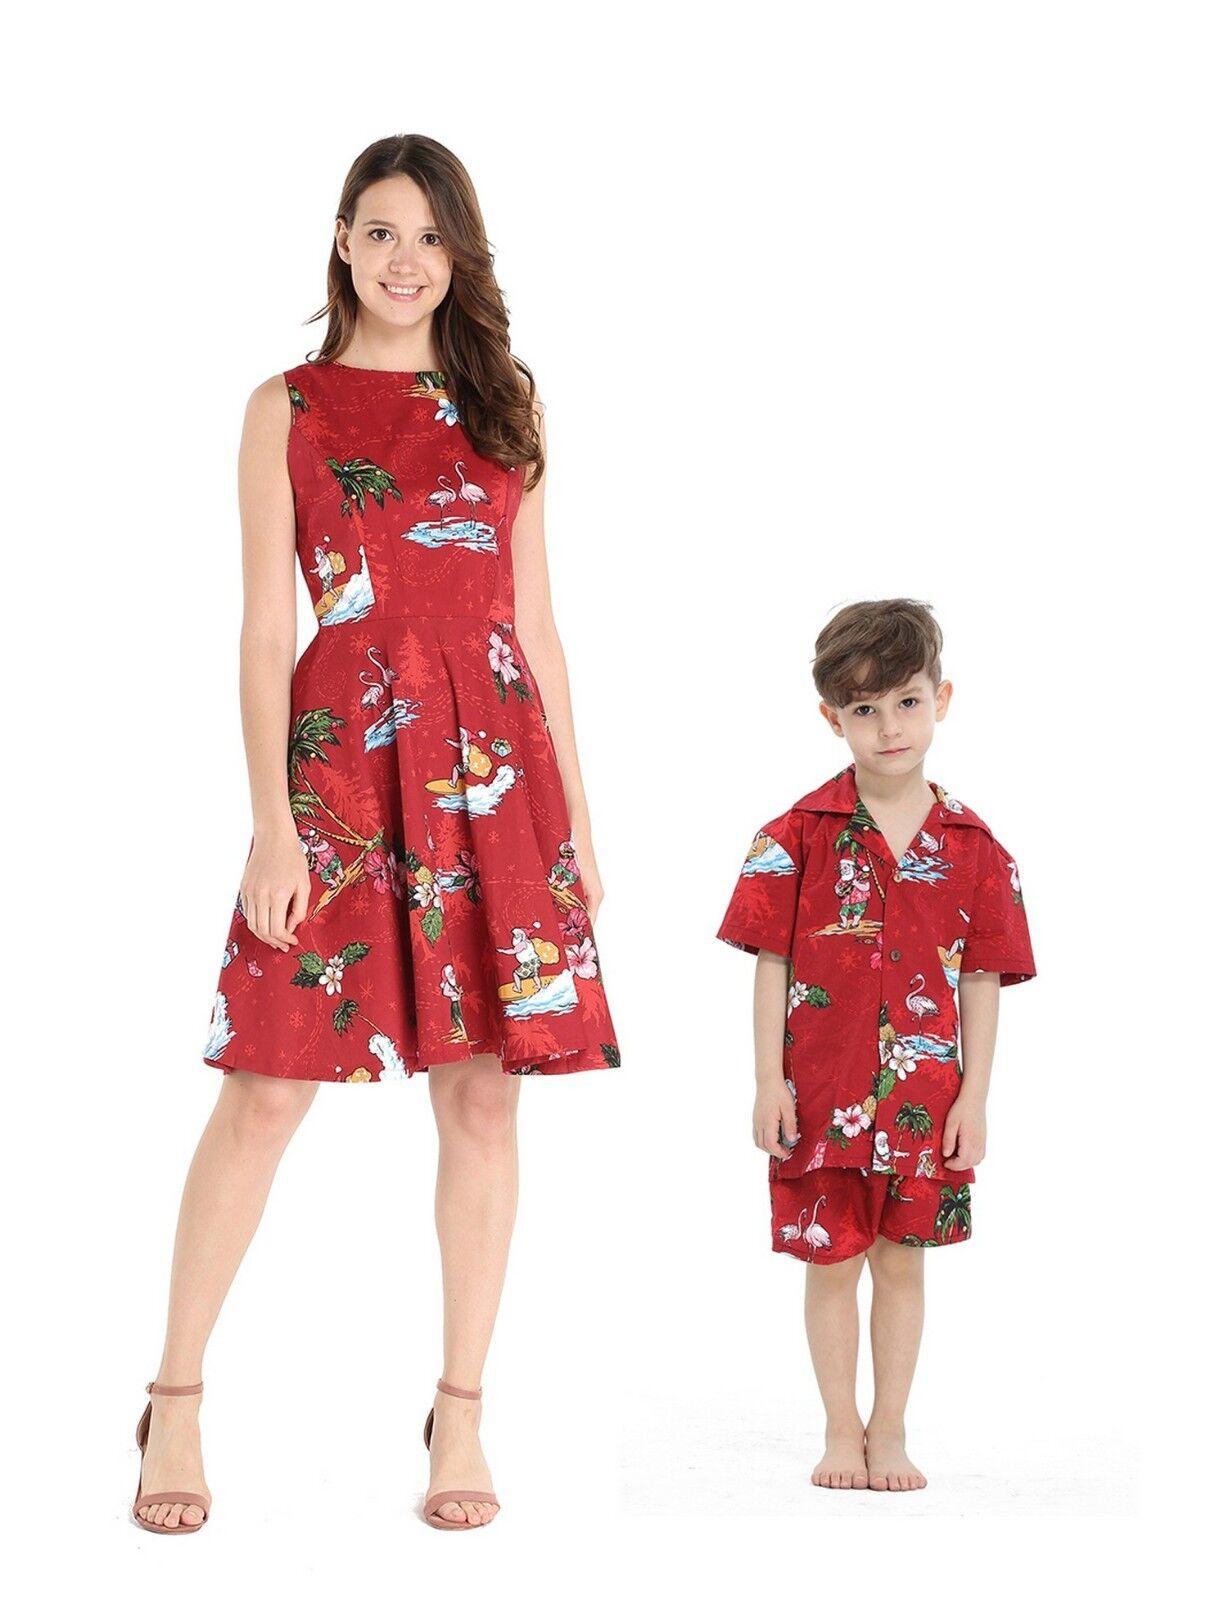 Hawaii Hangover Mother Son Outfit Vintage Dress Shirt Shorts Christmas Santa Red